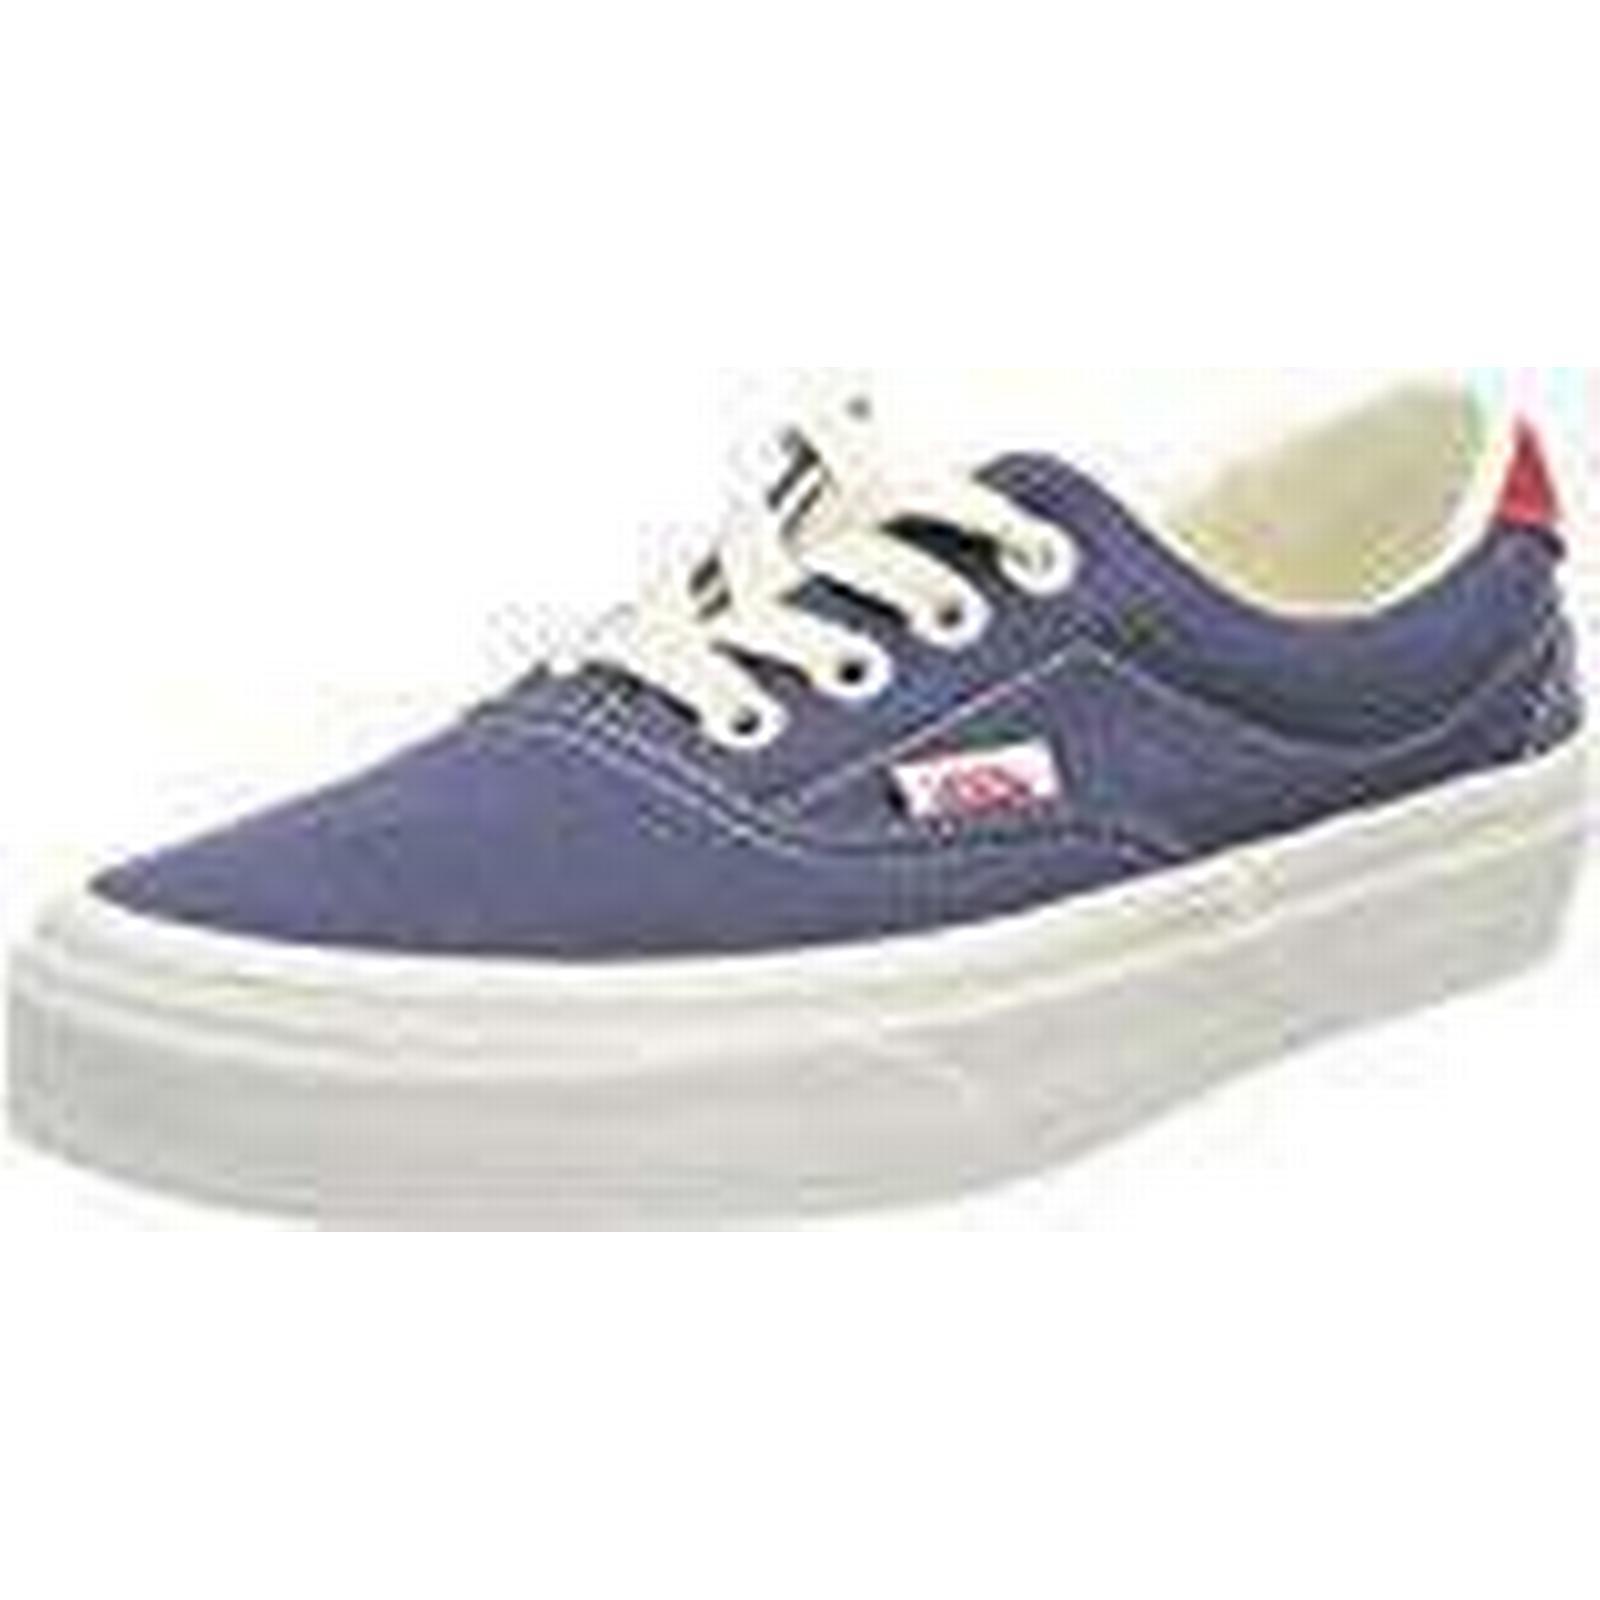 Vans Unisex Adults' Era 59 Trainers, Blue (Vintage Indigo/Rococco 38 Red Qkj), 5 UK 38 Indigo/Rococco EU e9cdaf